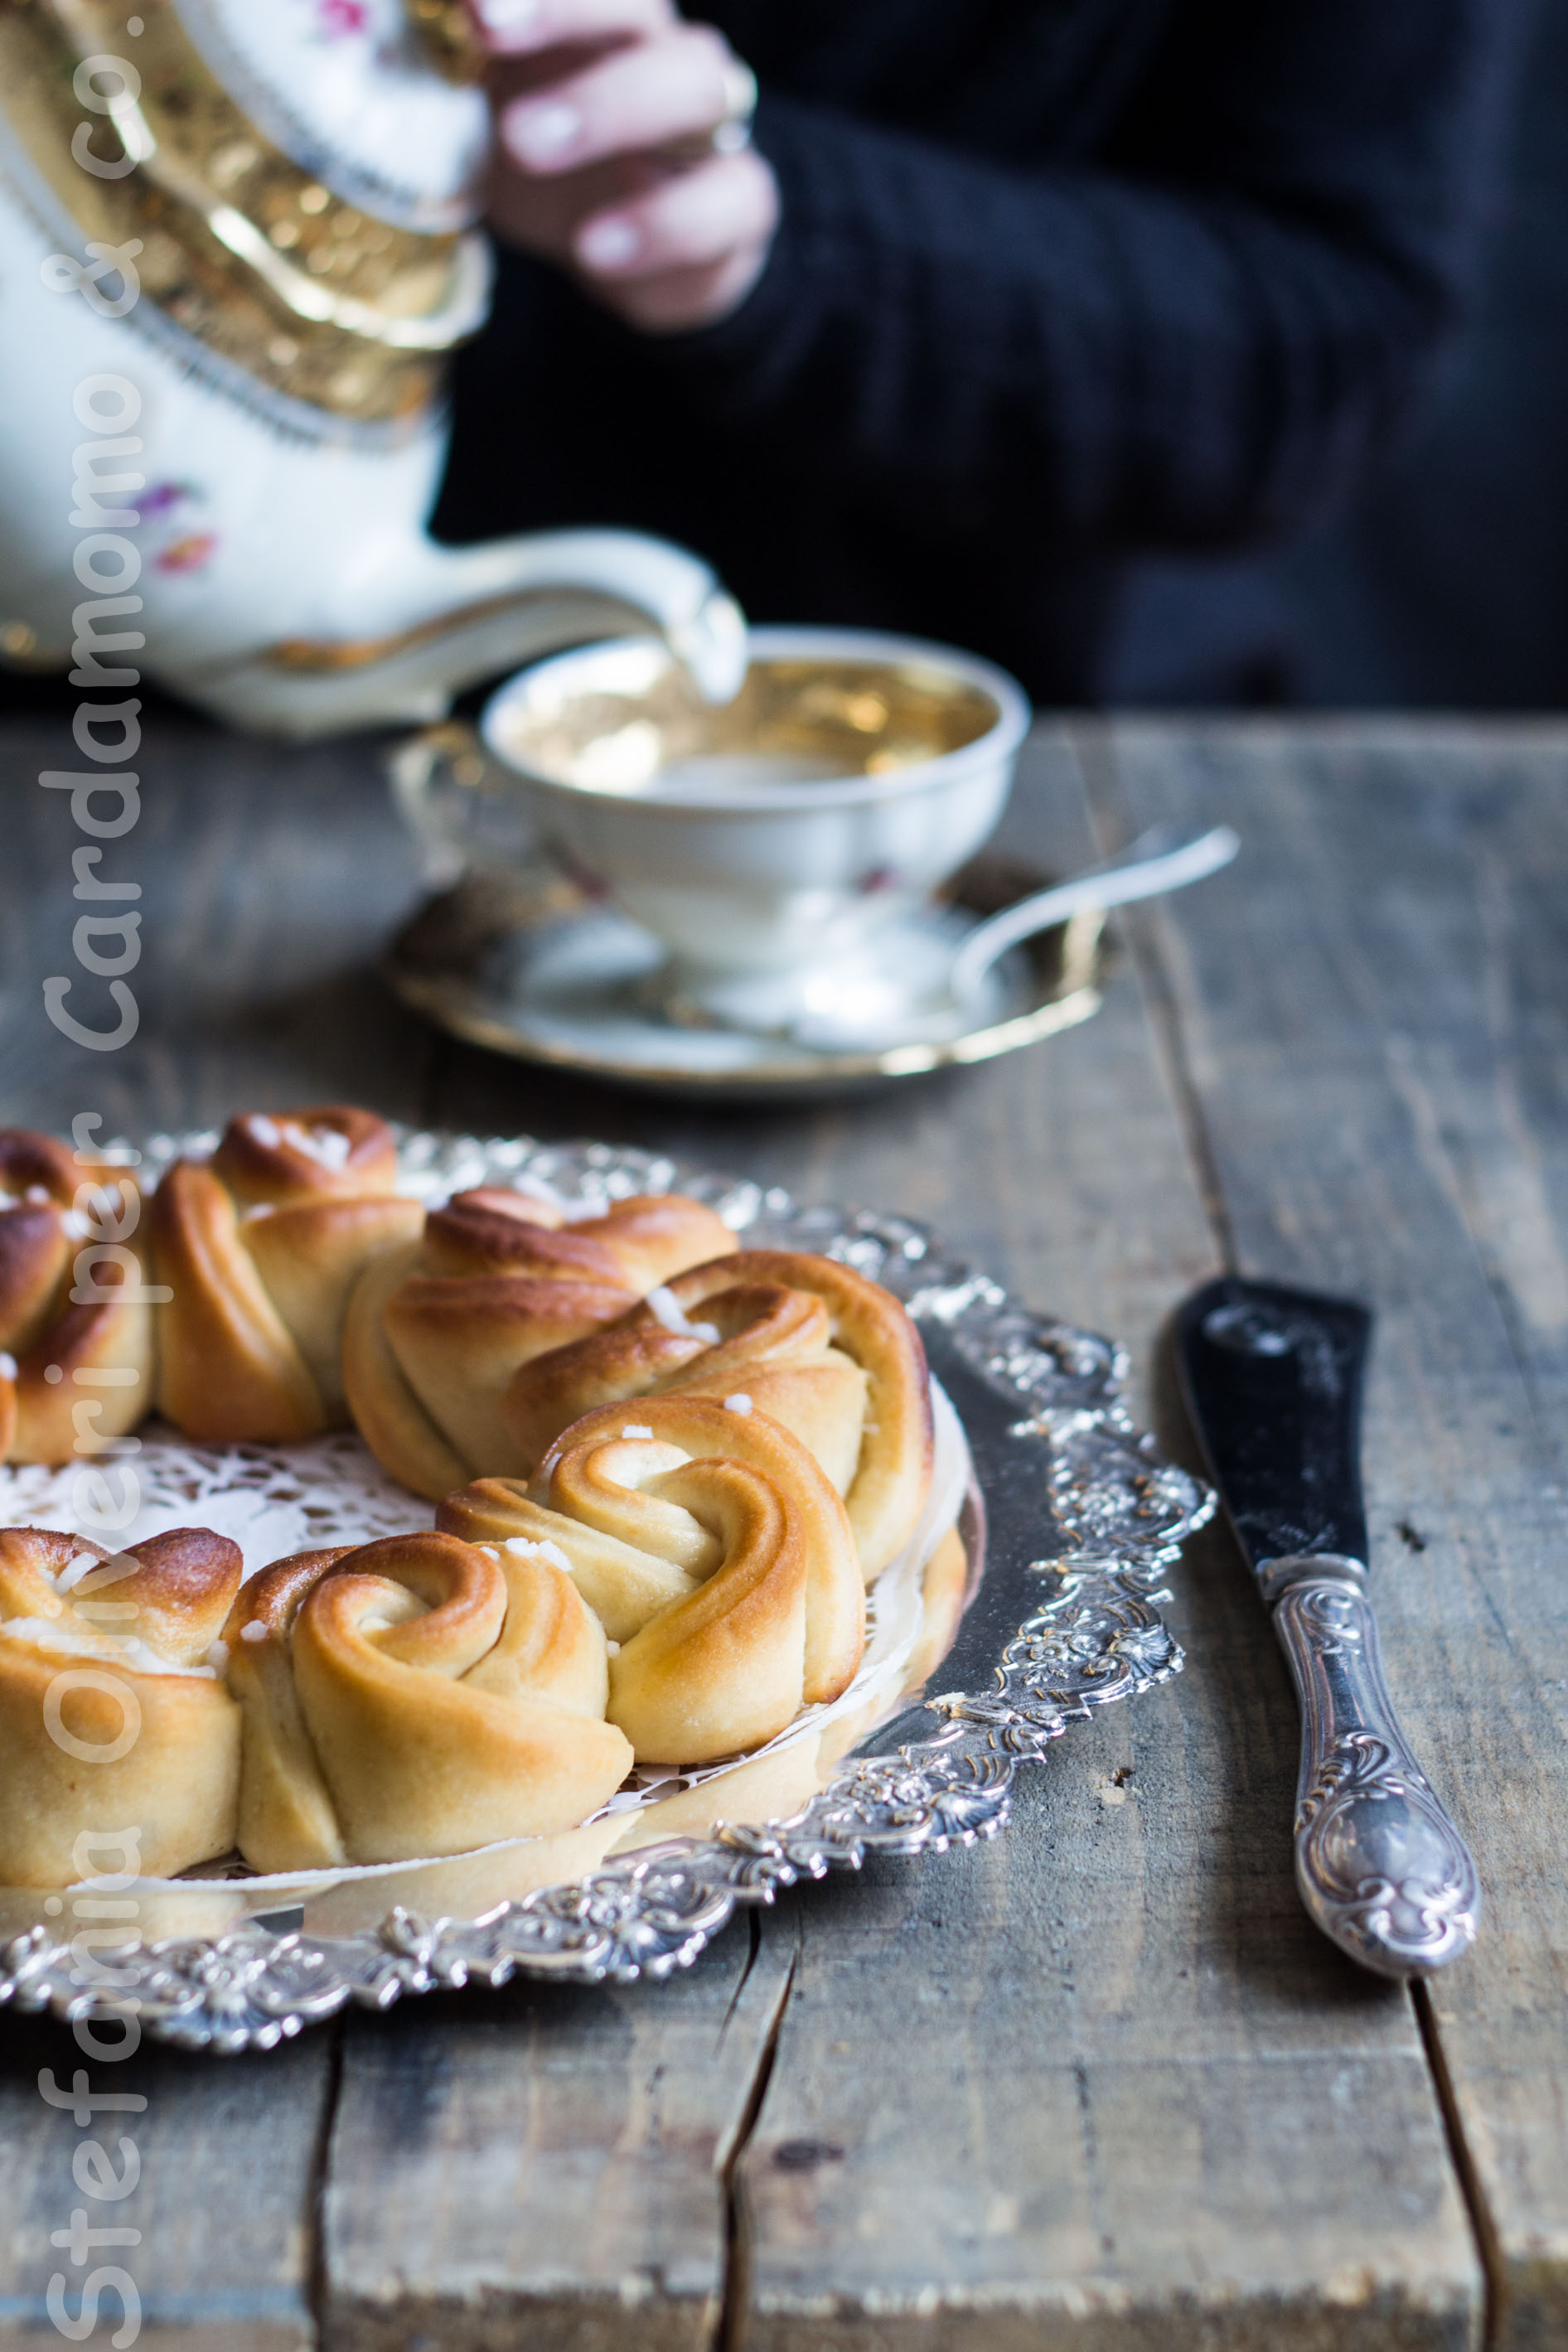 Challah senza glutine , pane ebraico - Cardamomo & co